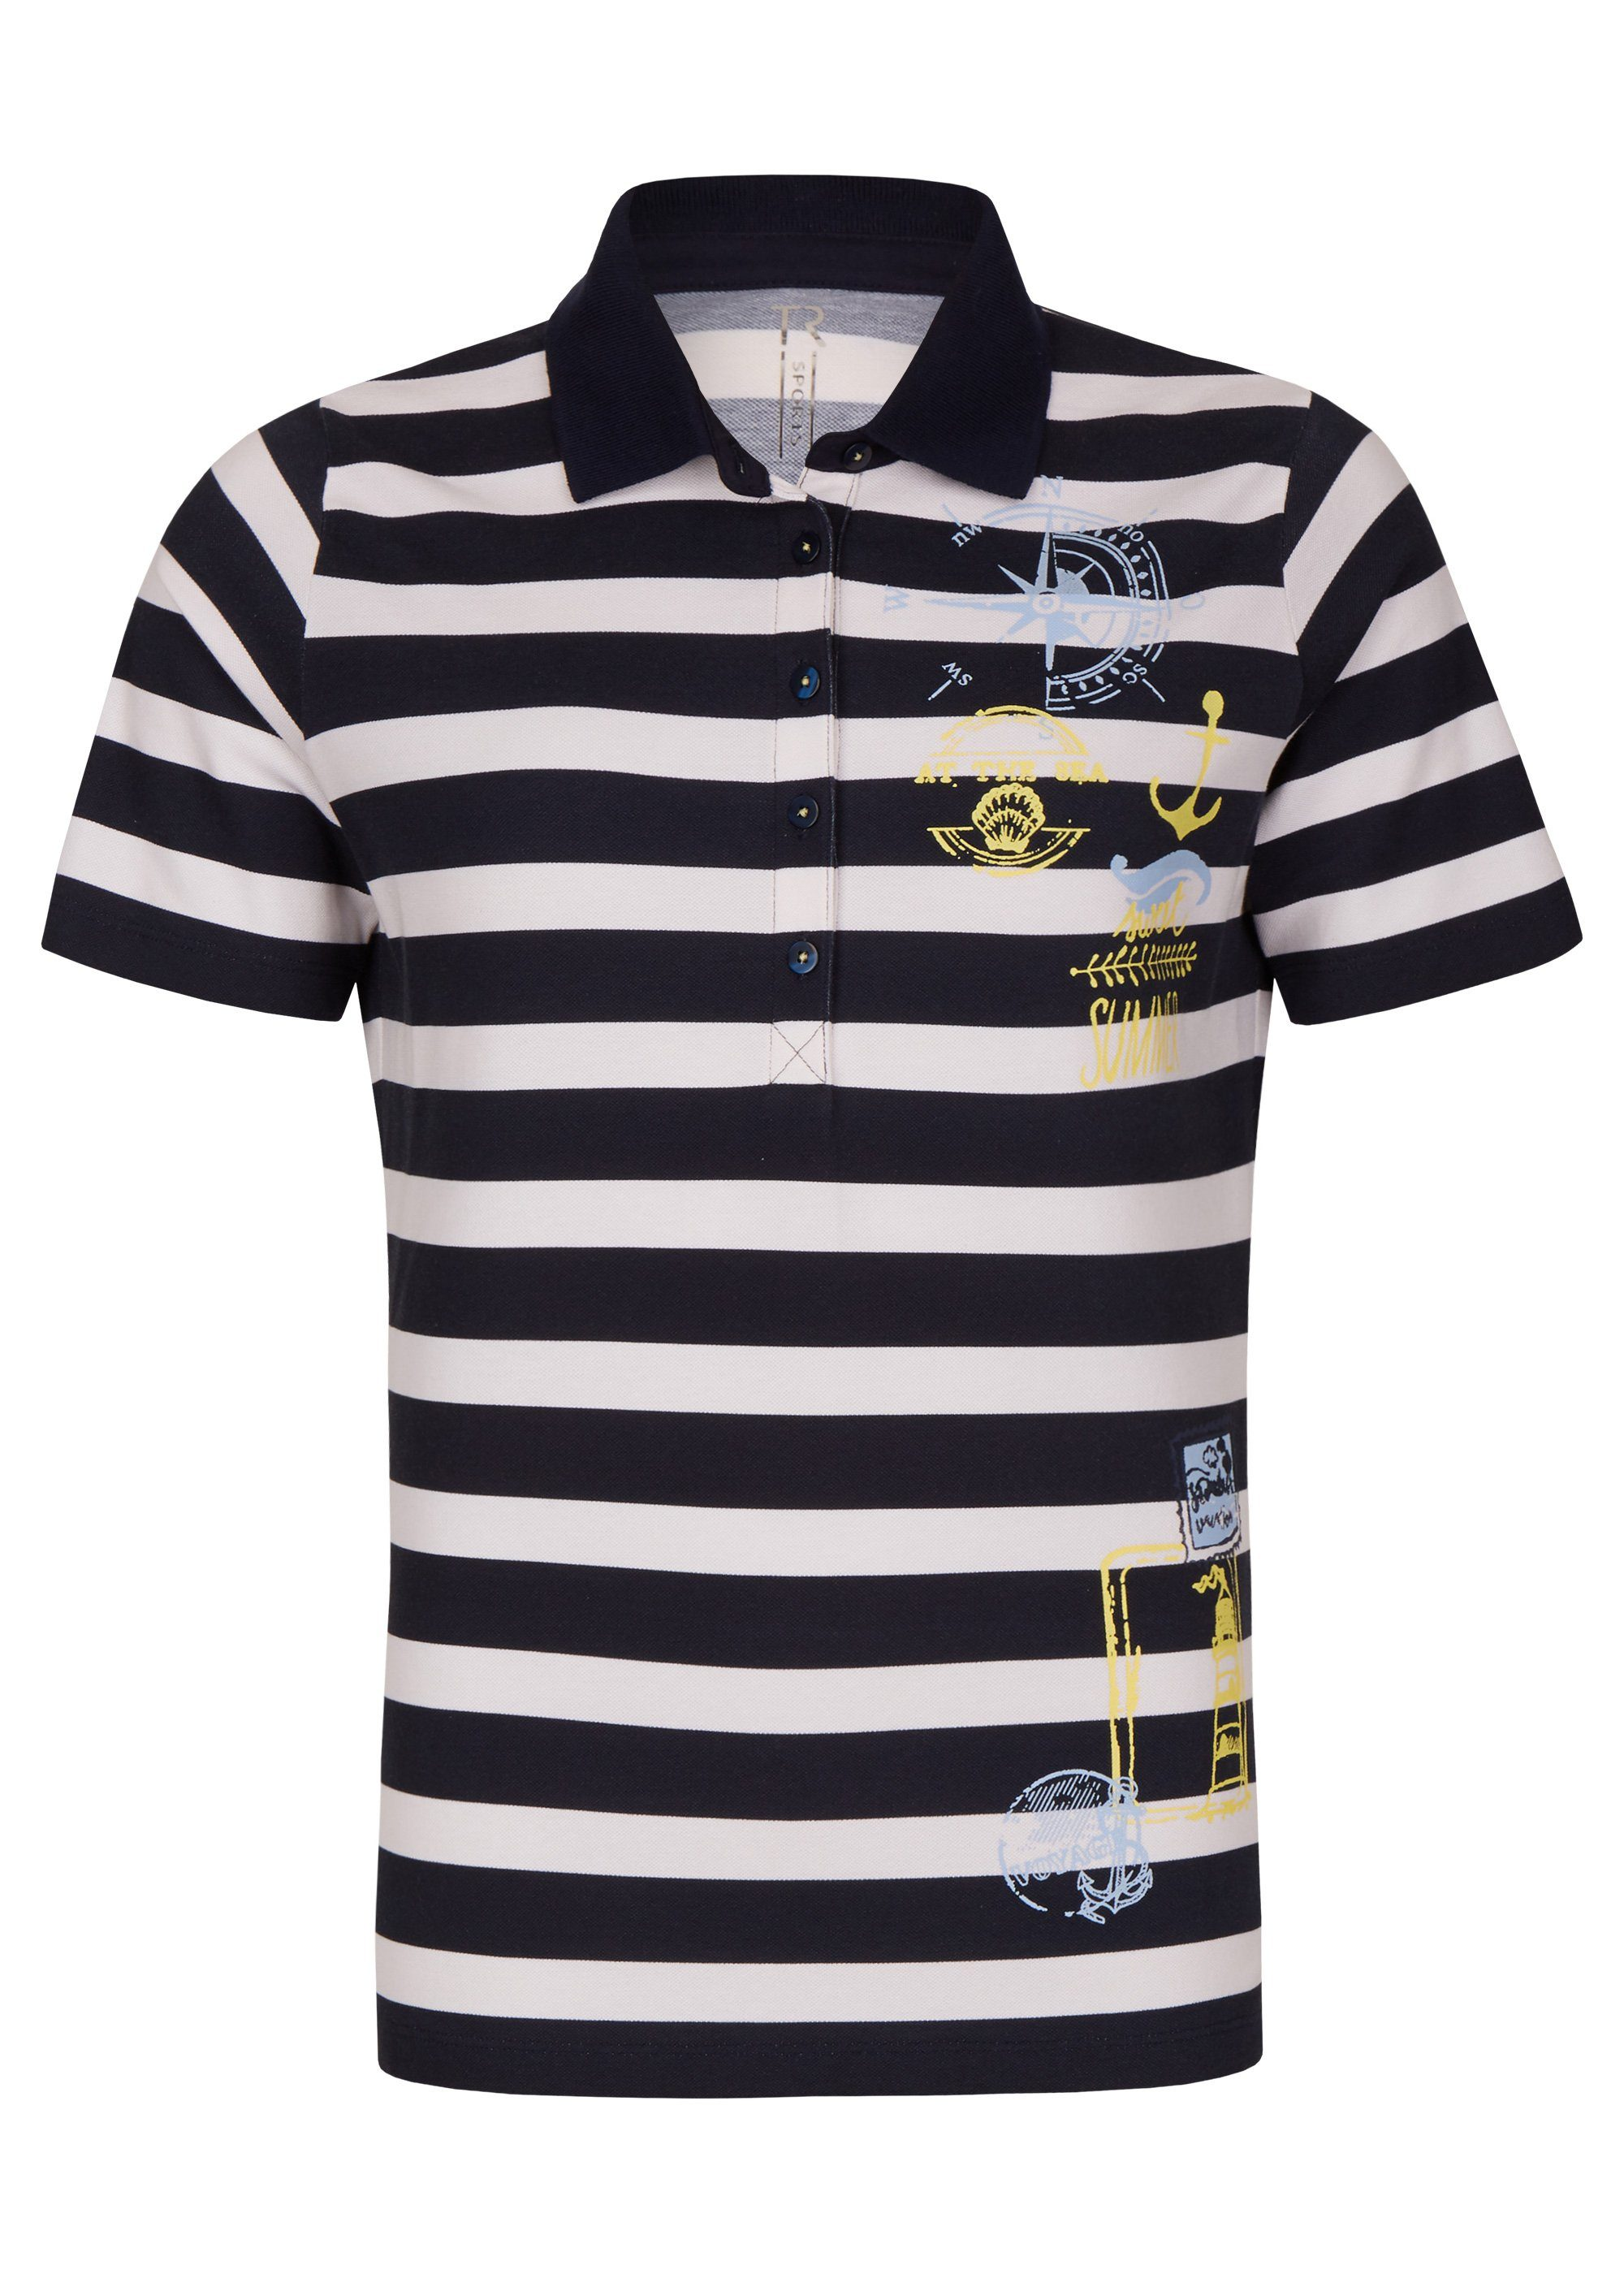 Thomas Rabe Poloshirt mit Ringeln und maritimen Motiven | Bekleidung > Shirts | Blau | Elasthan | Thomas Rabe